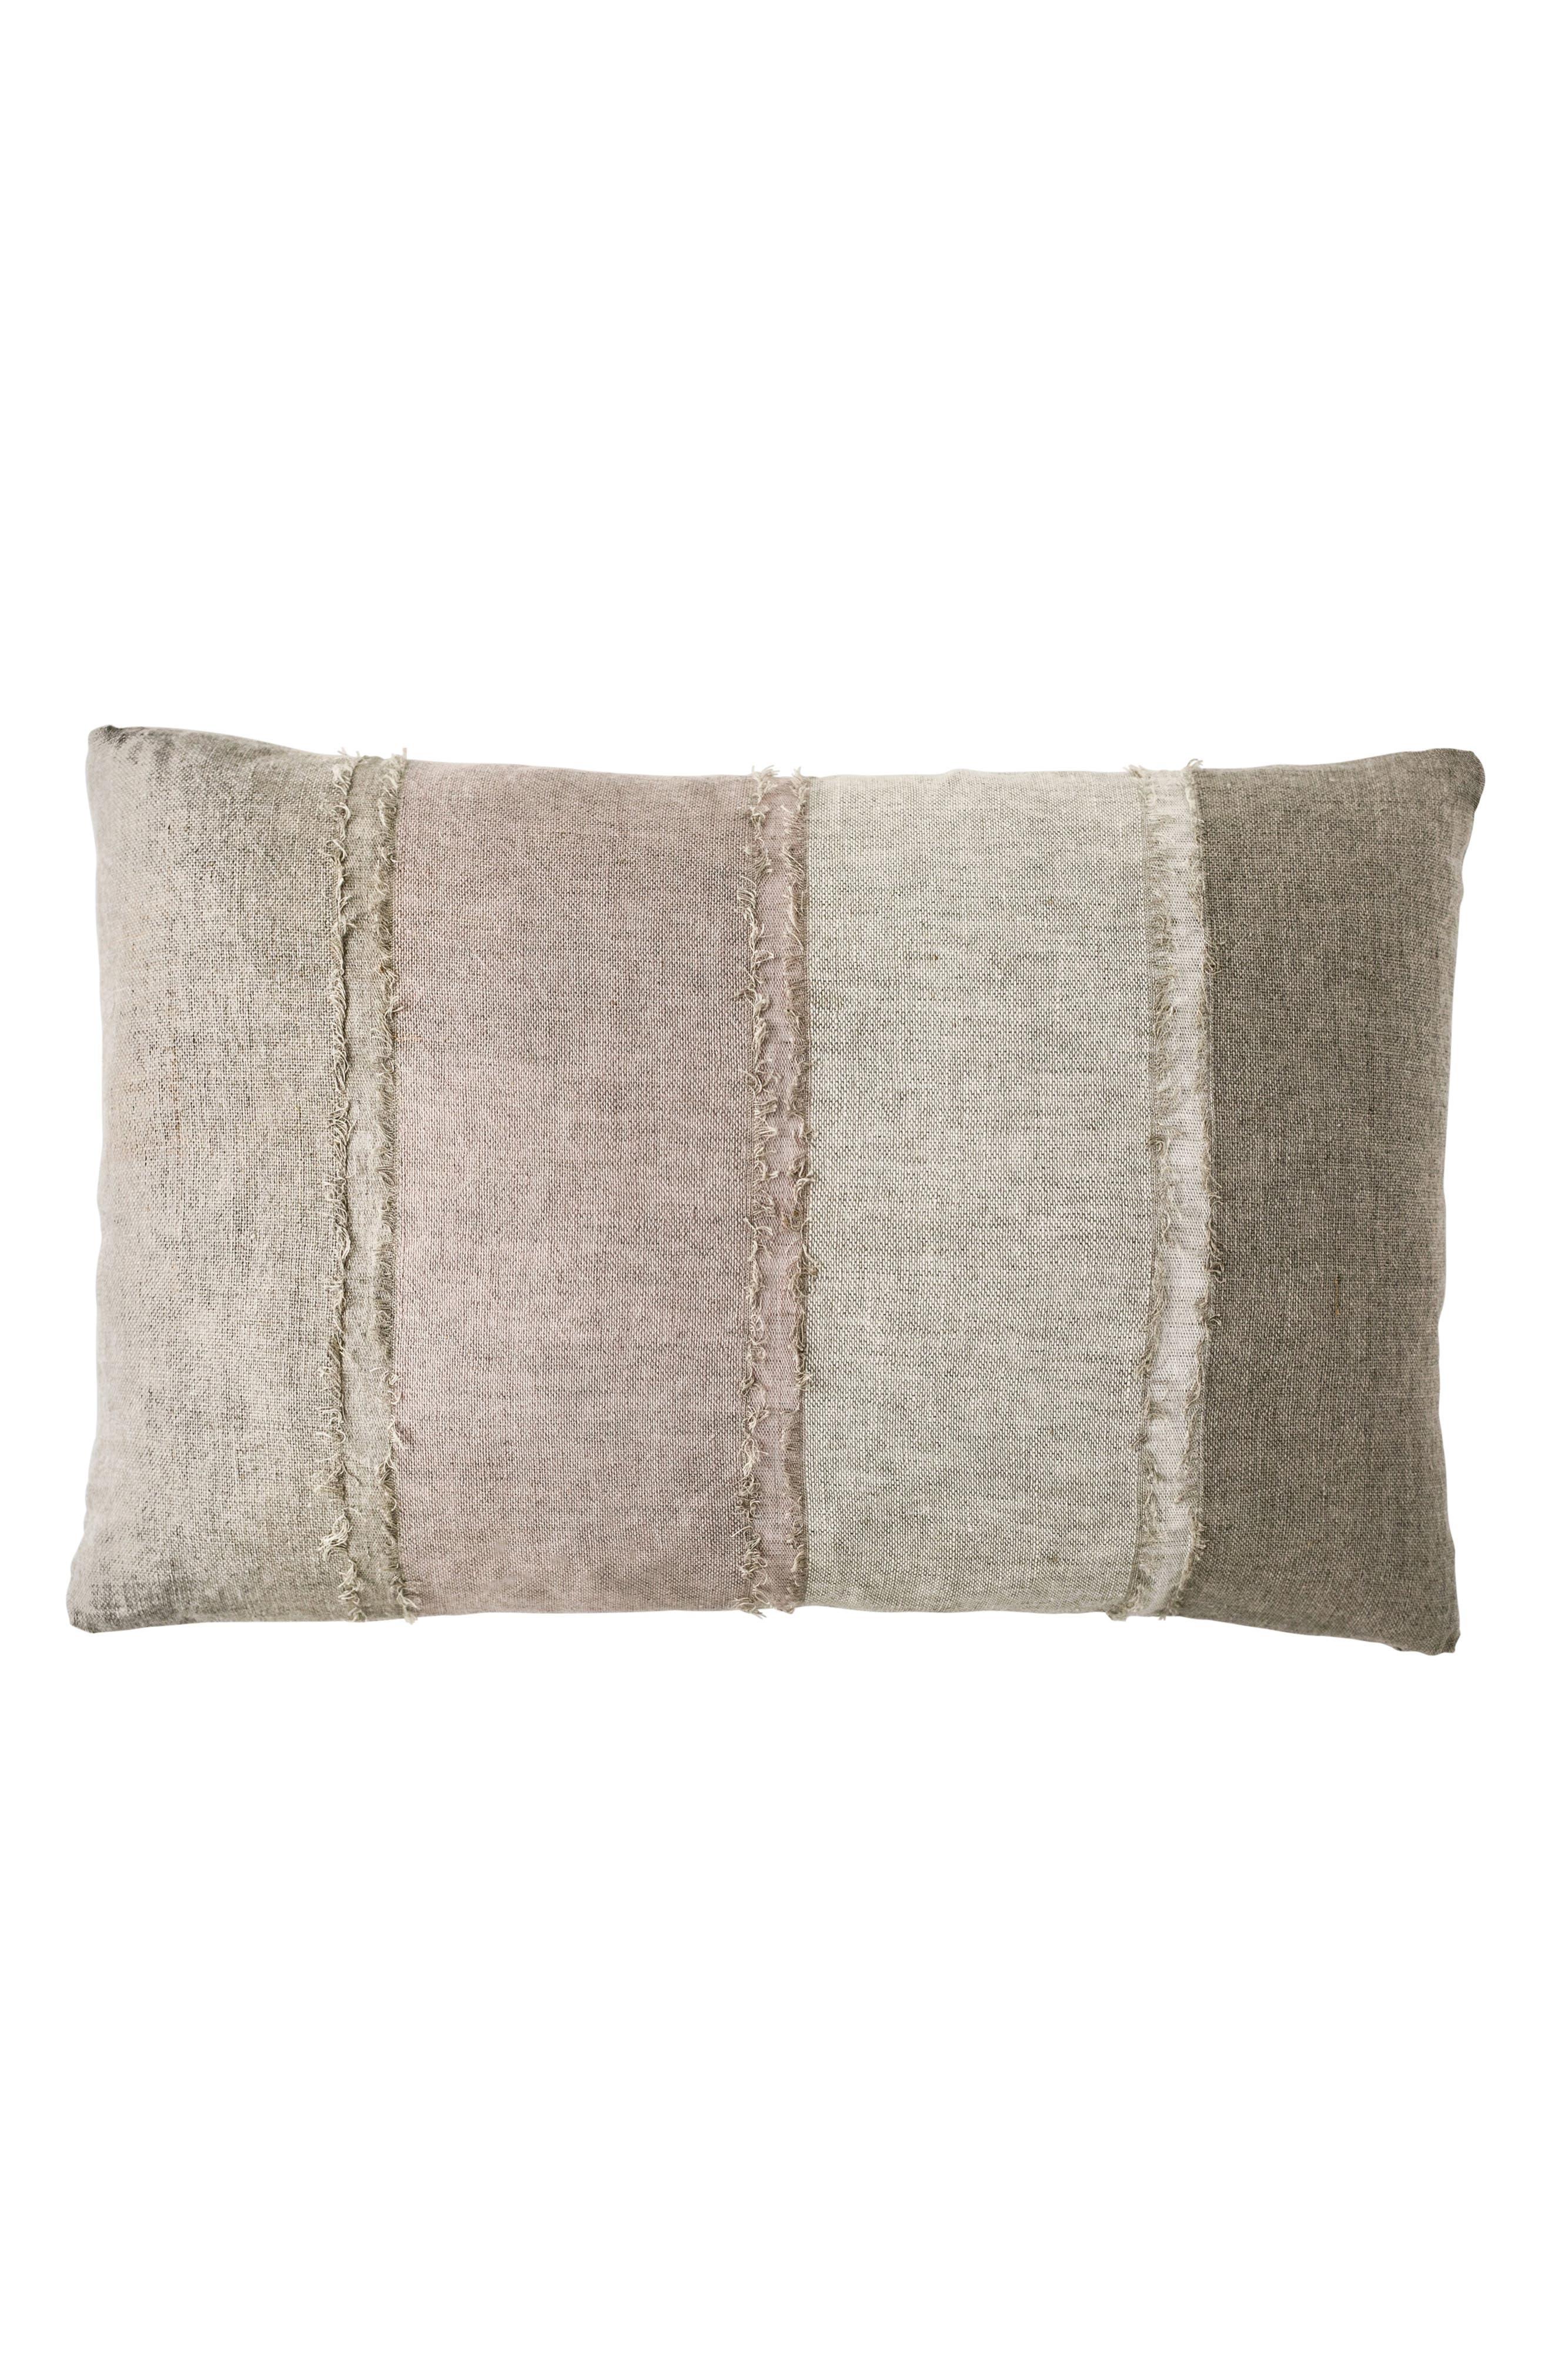 EADIE LIFESTYLE, European Linen Paneled Accent Pillow, Main thumbnail 1, color, SEA MIST MULTI